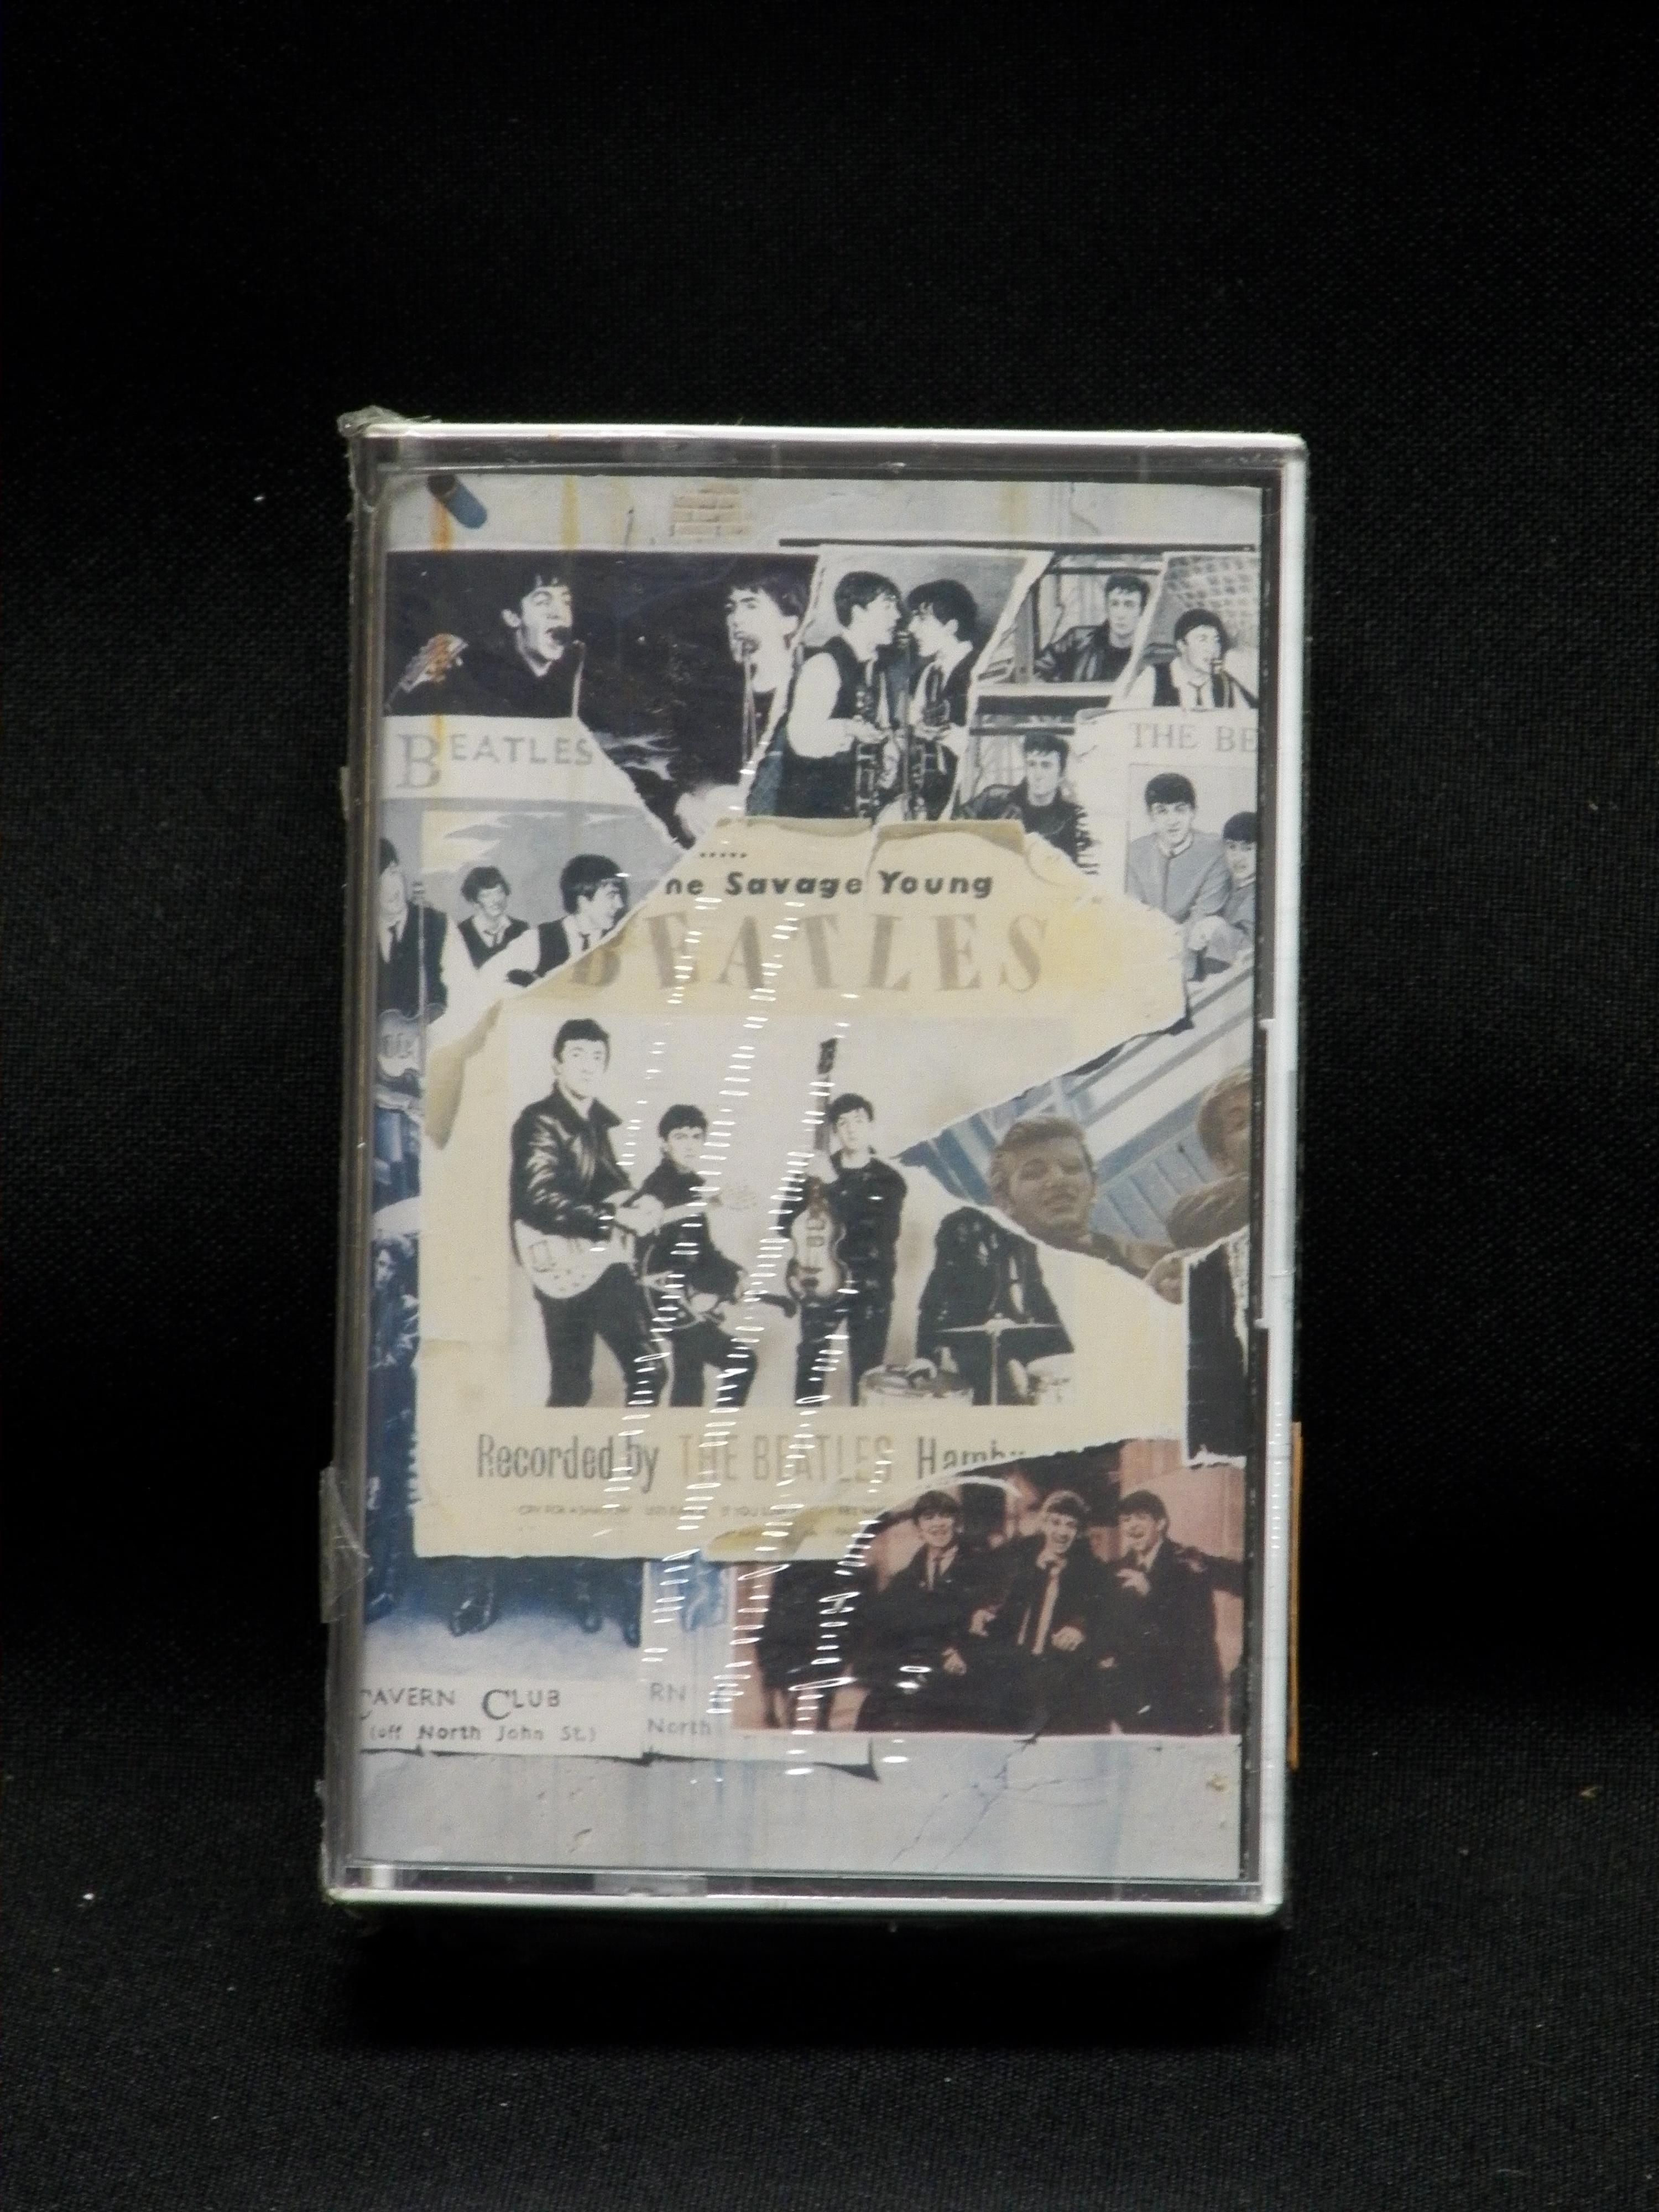 SEALED 2 Cassette Set The Beatles Anthology 1 1995 Capitol Records -  VinylBay777